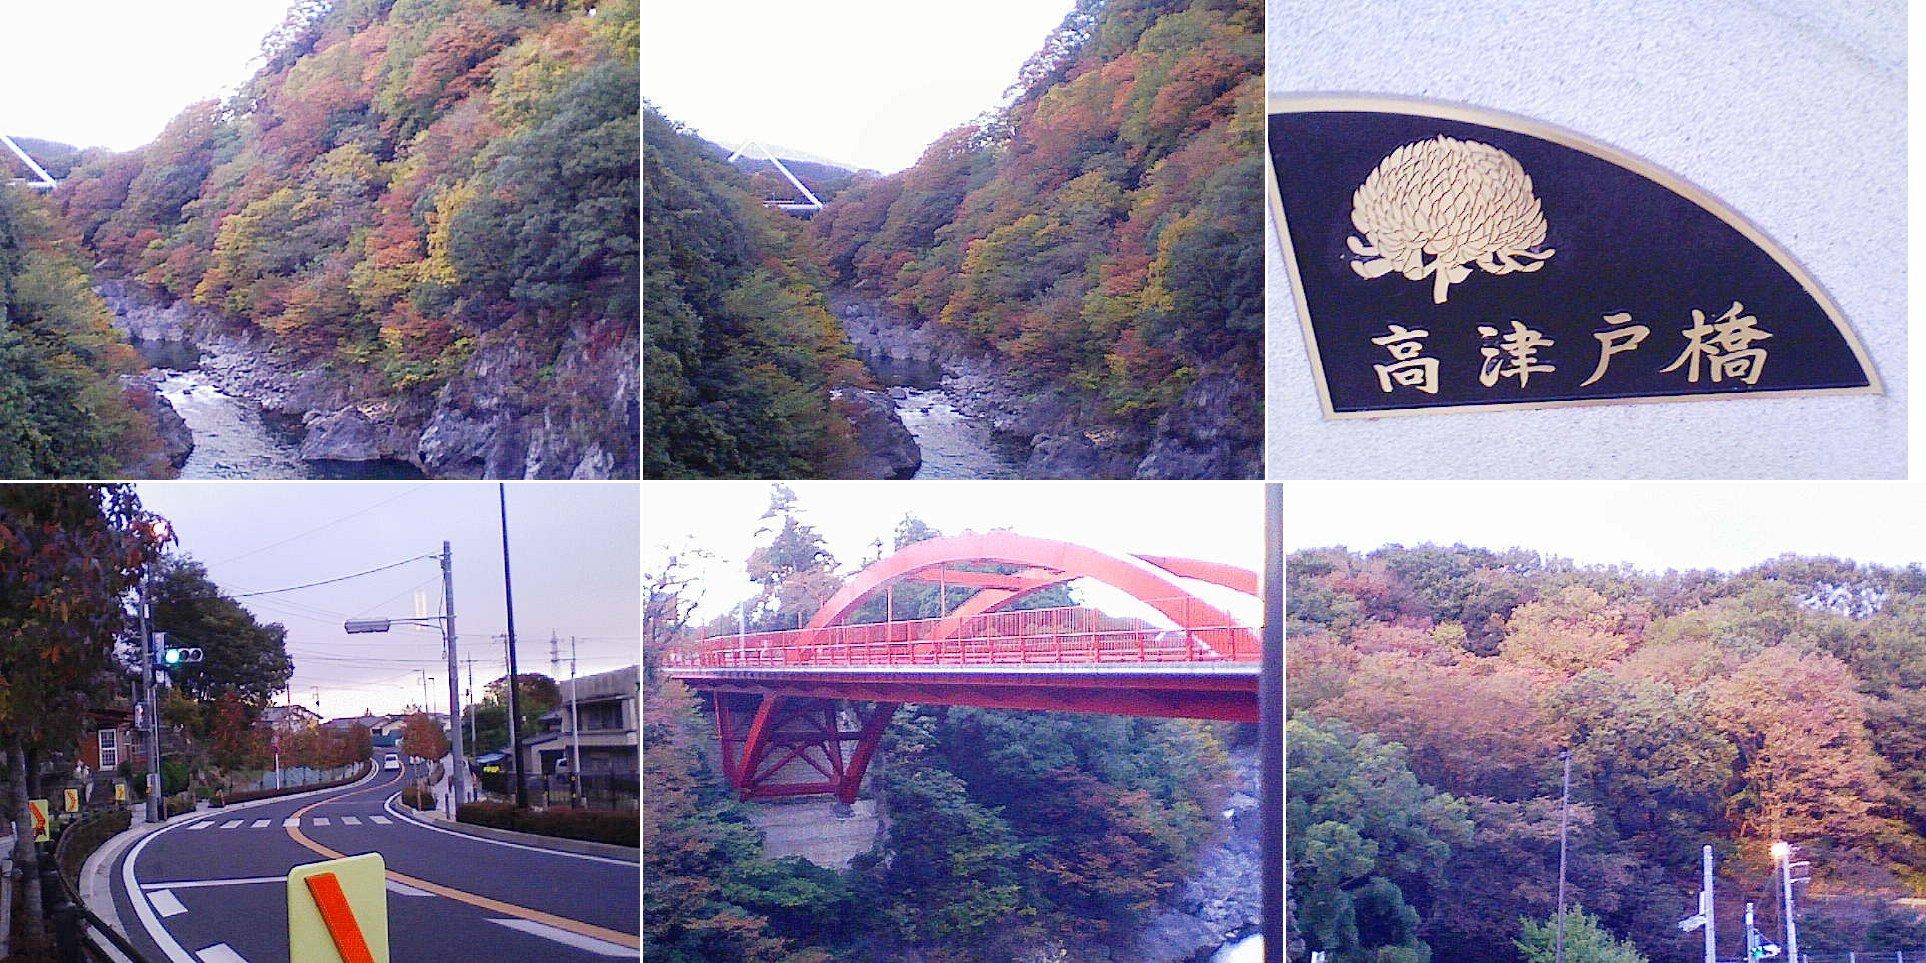 oomama_kiku2013_23.jpg